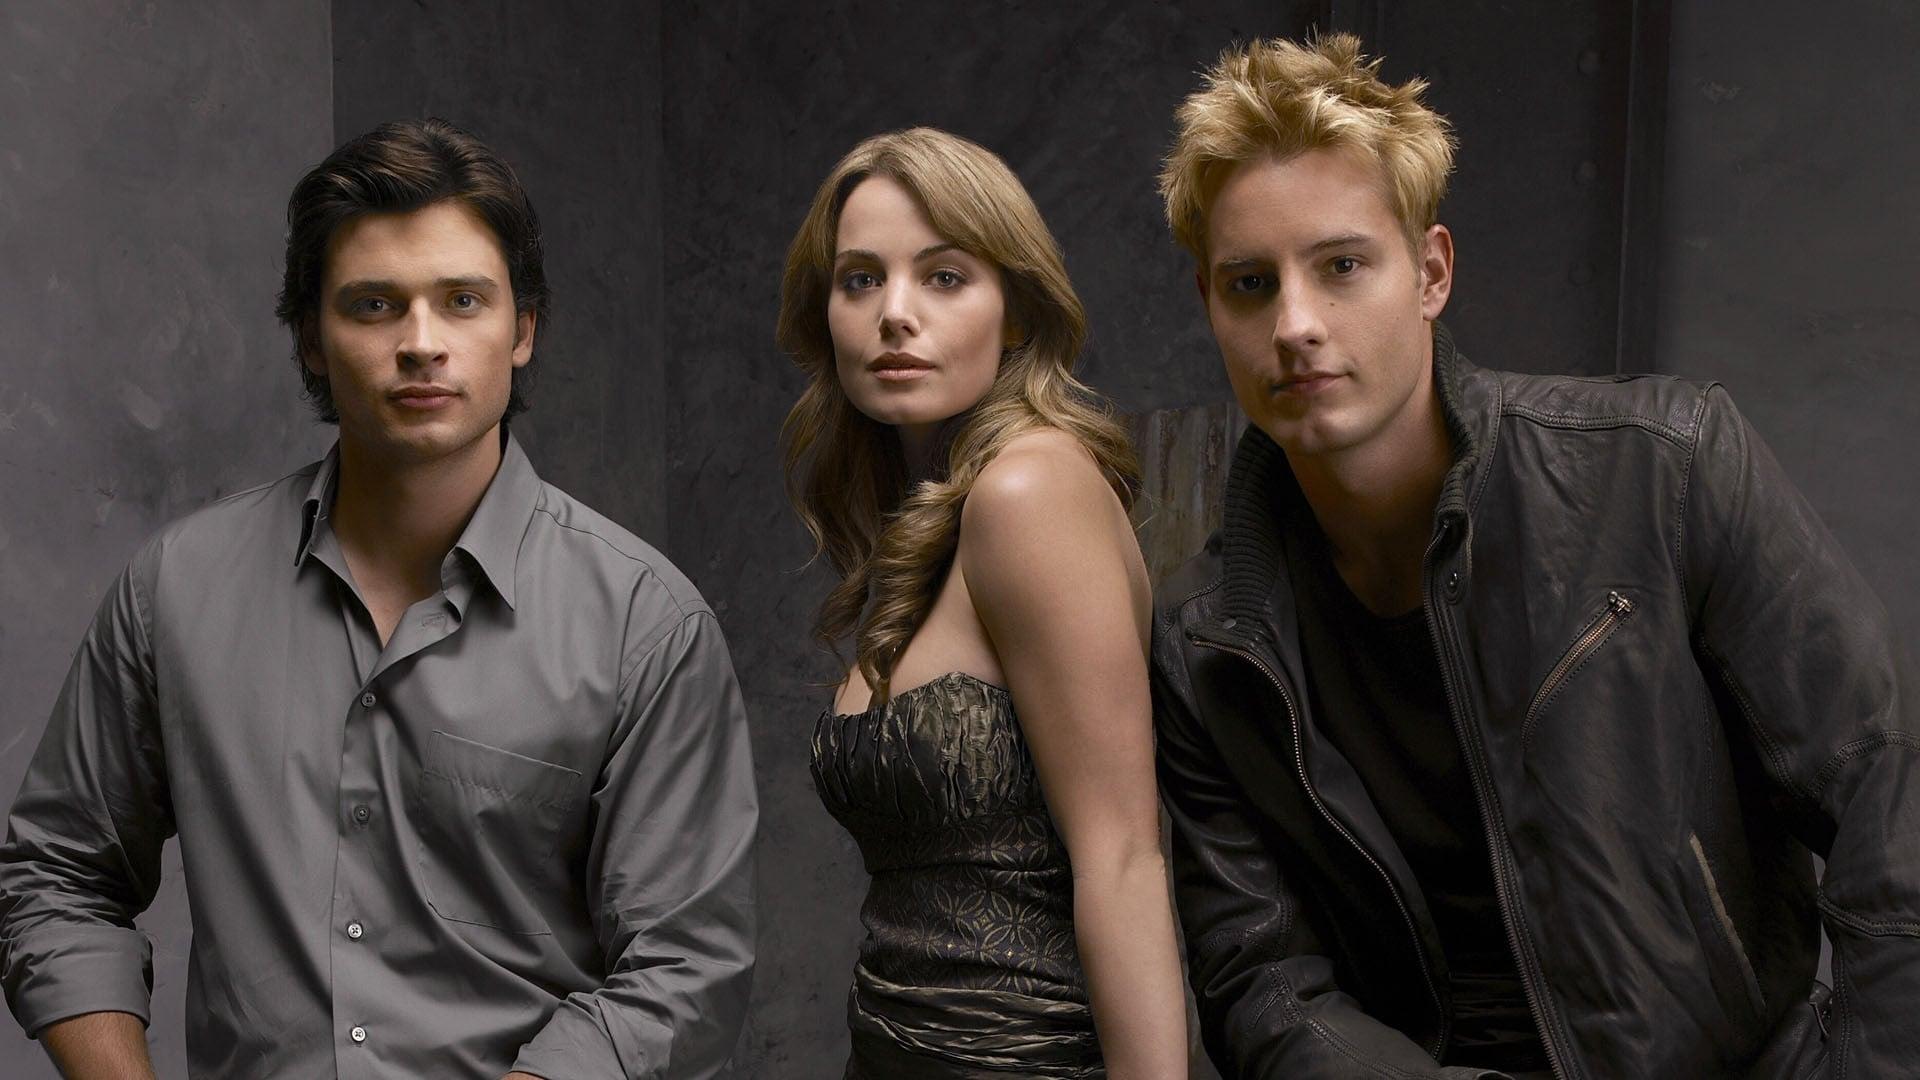 Smallville - Season 10 Episode 3 Supergirl